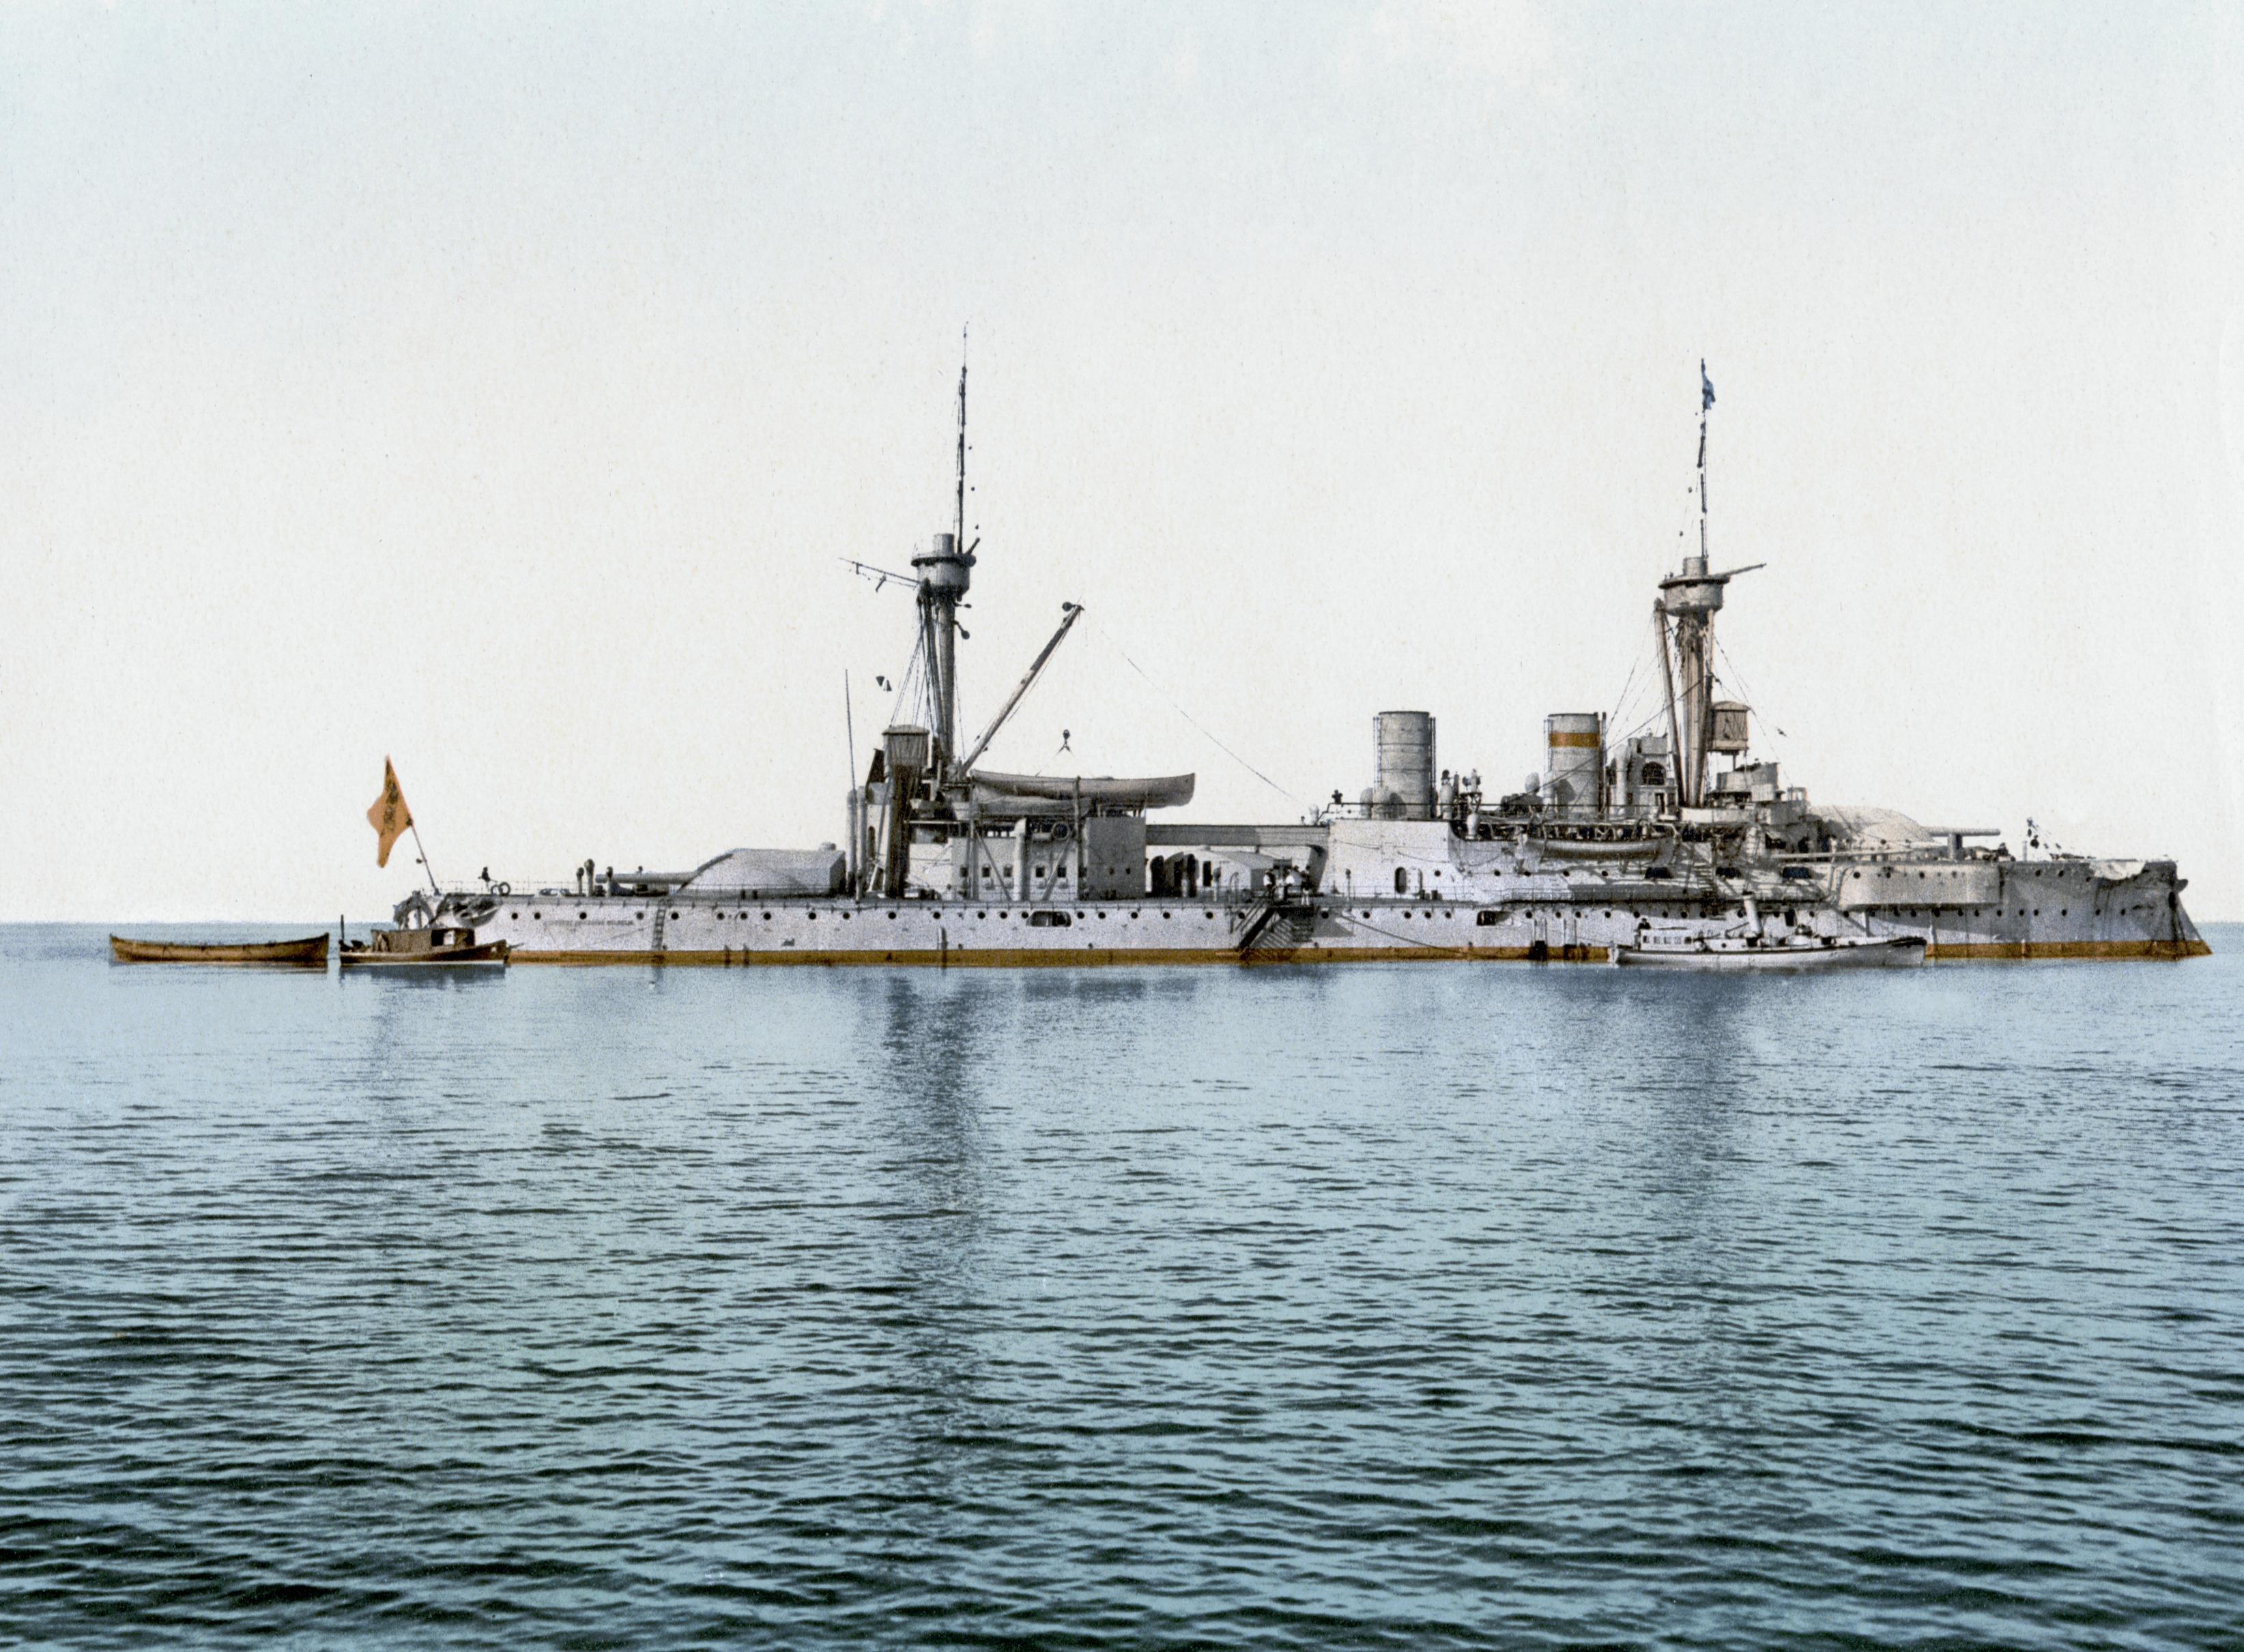 Brandenburg-class battleship - Wikipedia